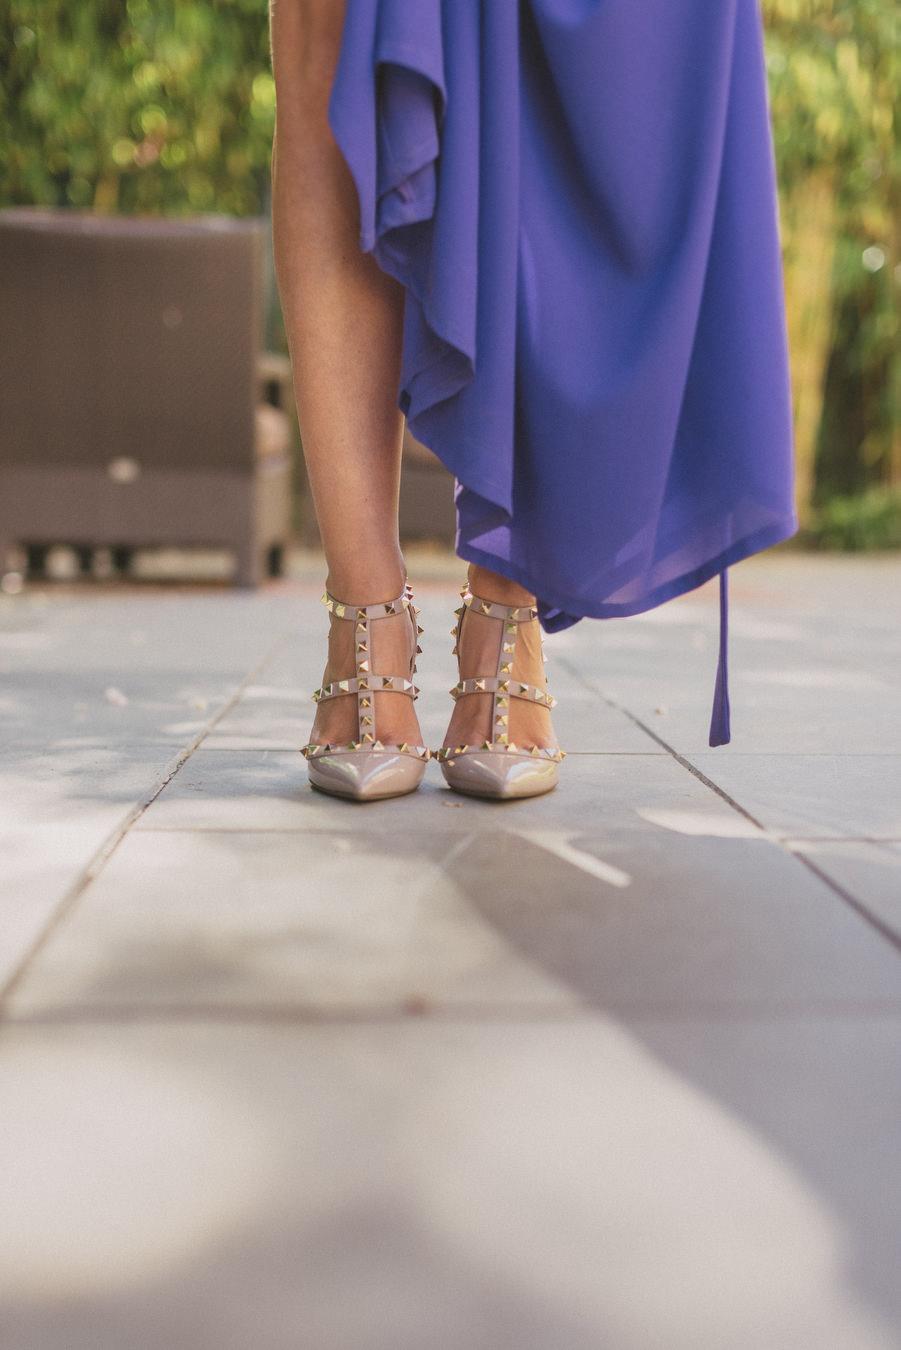 calista-one-lista-de-bodas-online-blog-de-bodas-bossanova-looks-invitadas-biombo-7